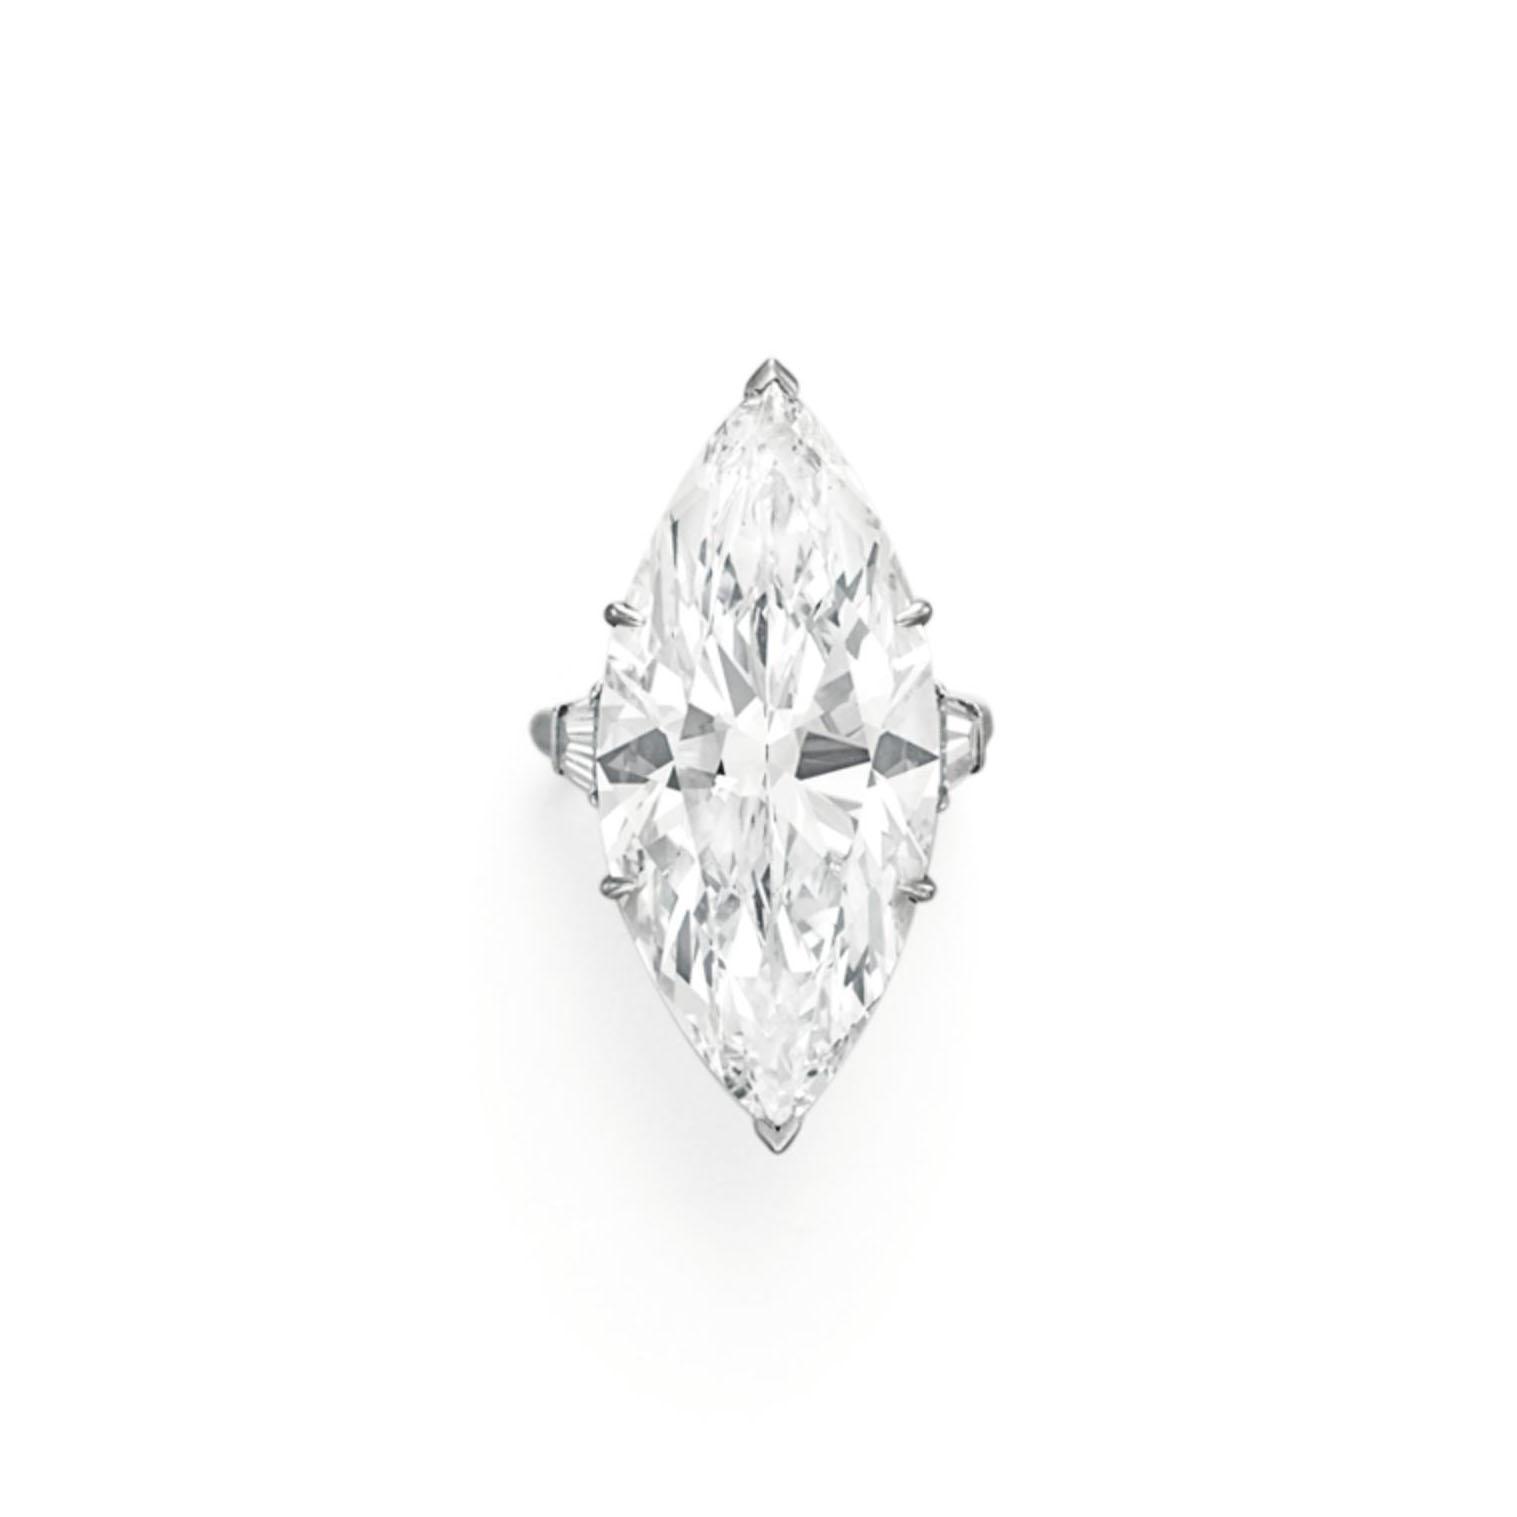 A DIAMOND RING, BY HARRY WINSTON